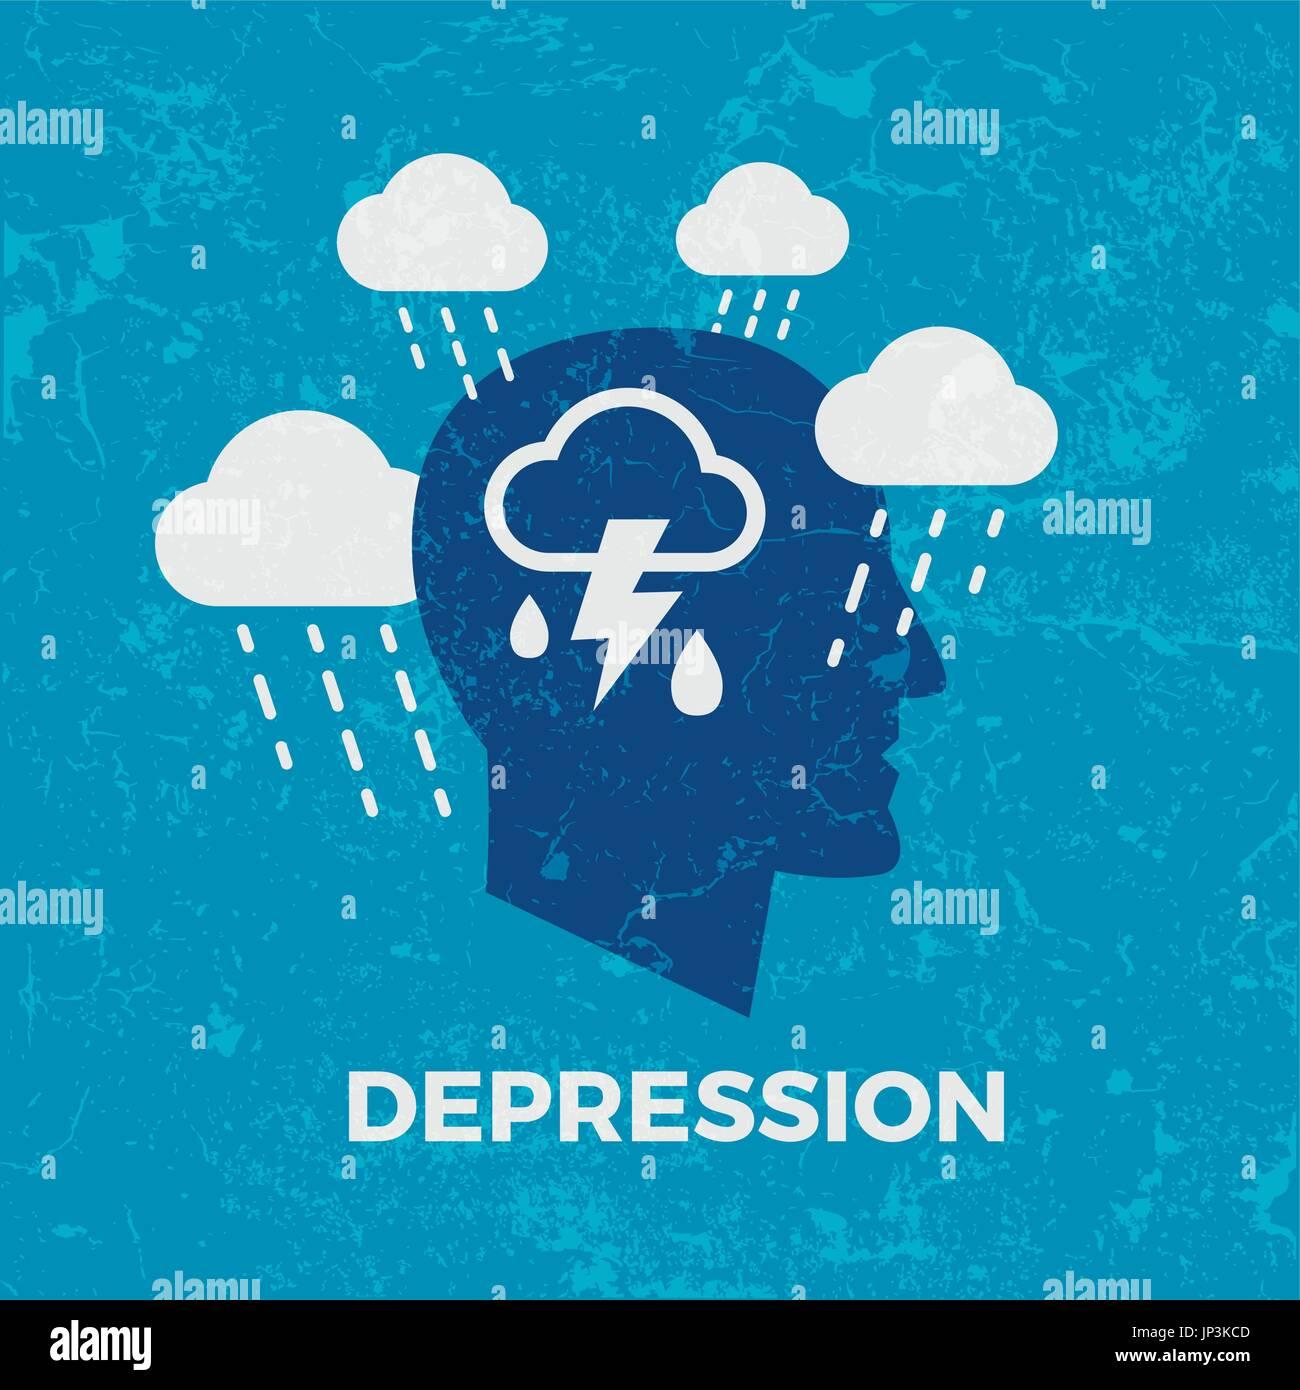 Depression. Concept vector illustration - Stock Image